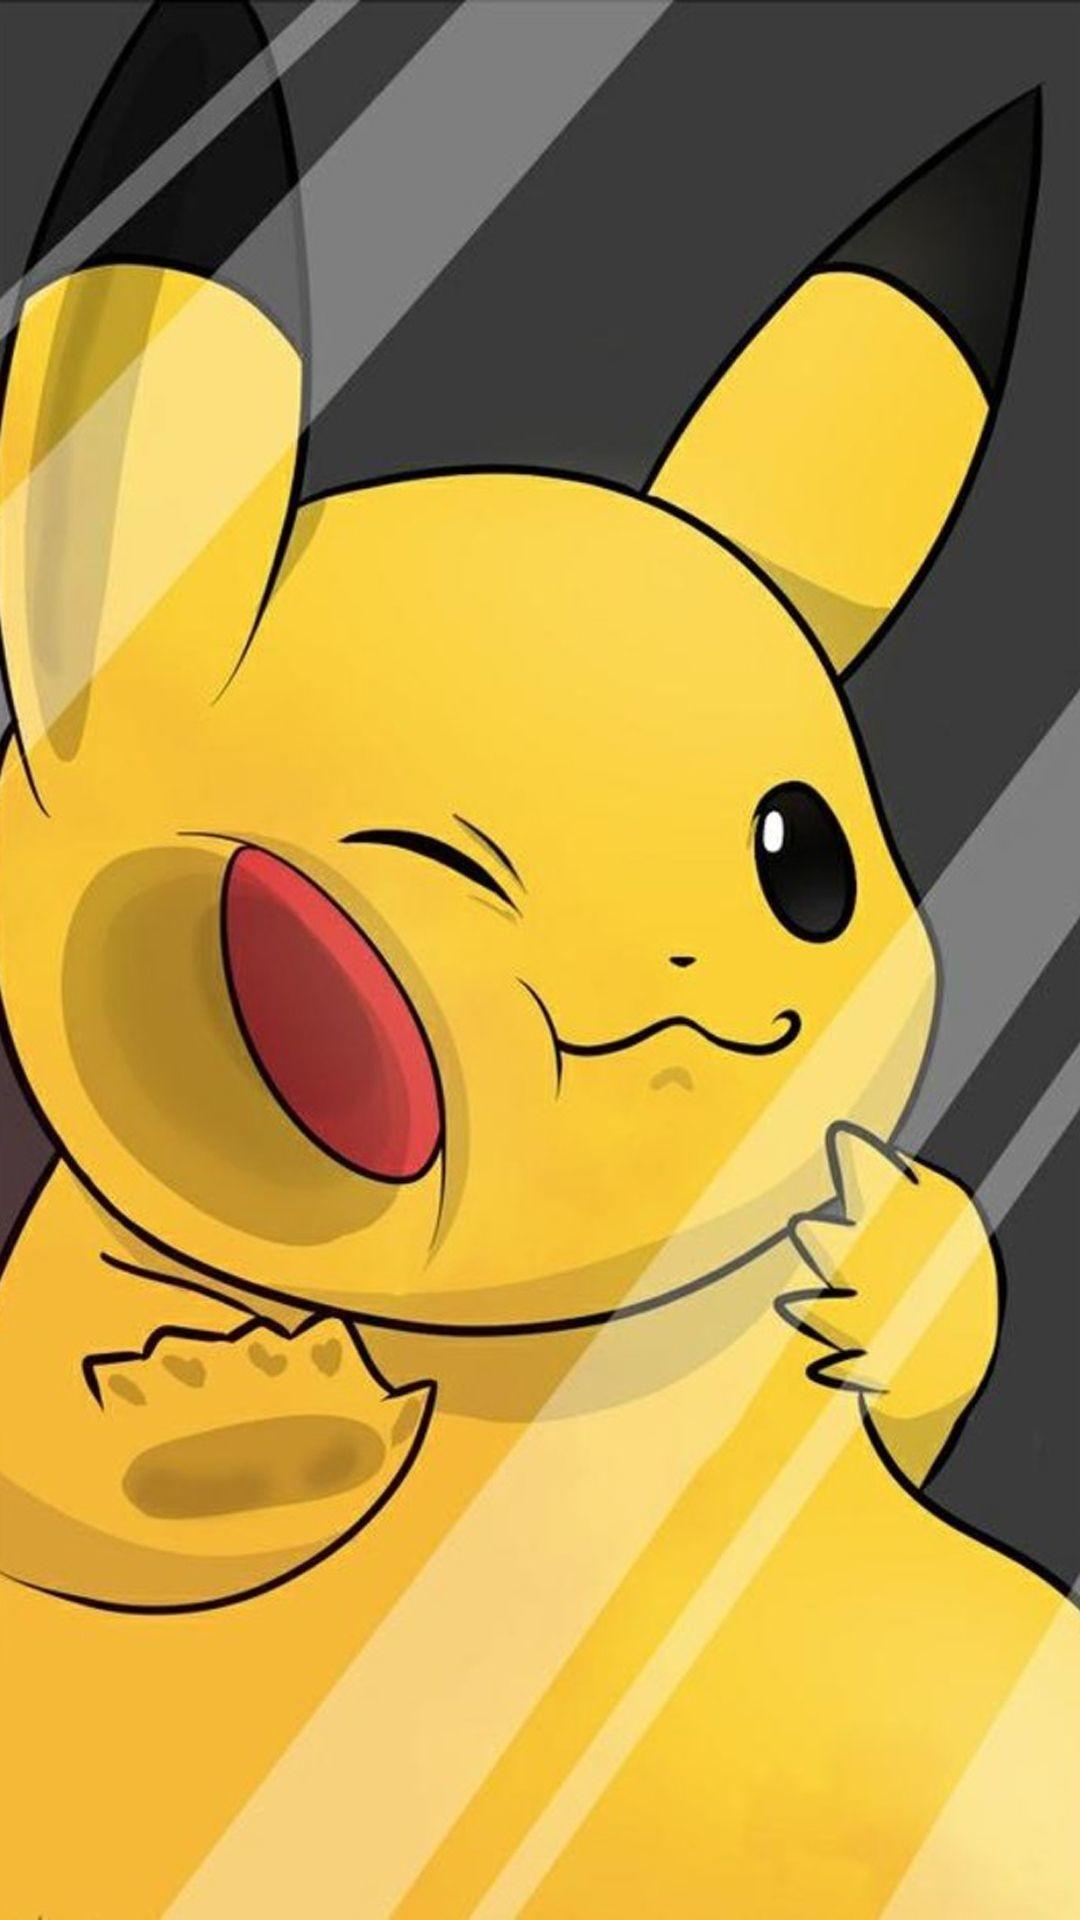 1080x1920 Pikachu Hd Wallpapers For Iphone 7 Pikachu Wallpaper Iphone 1080x1920 Wallpaper Teahub Io